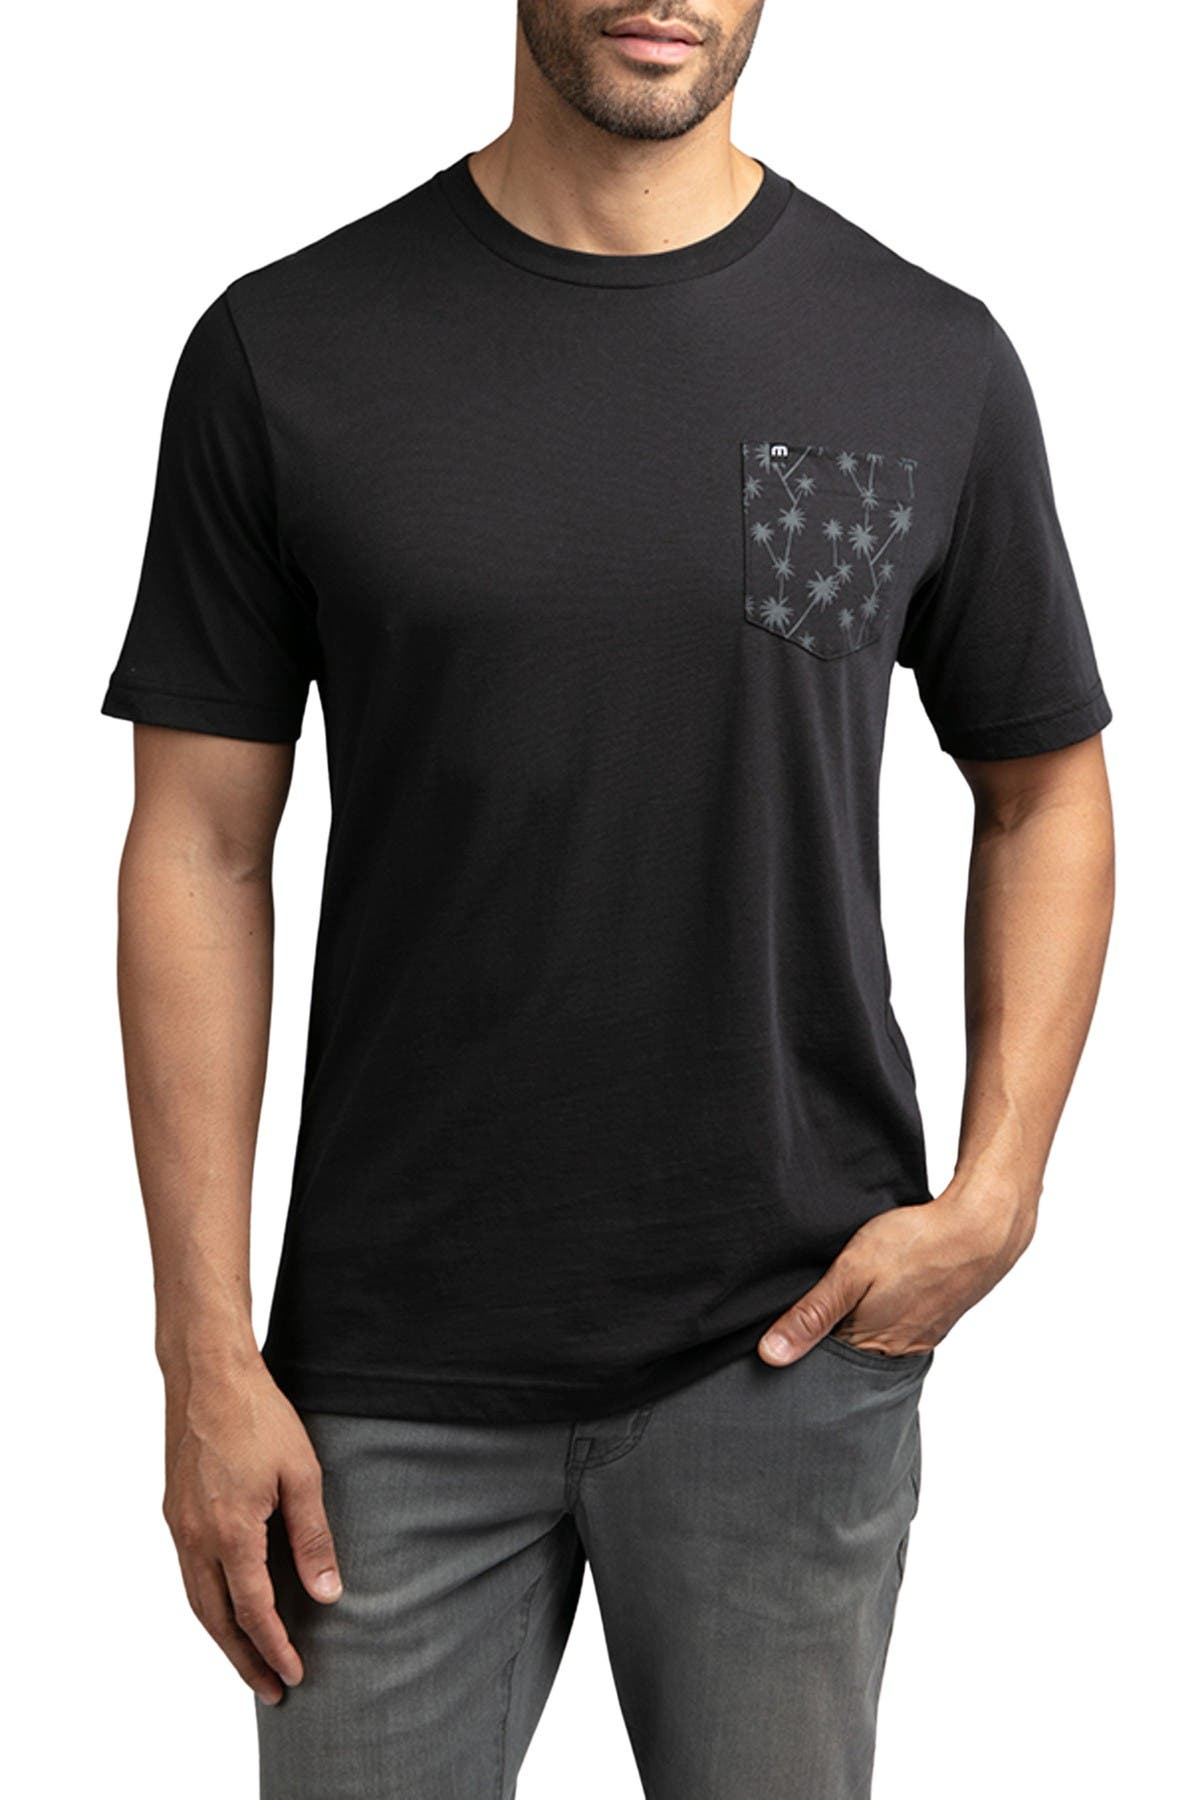 Image of TRAVIS MATHEW Davies Short Sleeve T-Shirt